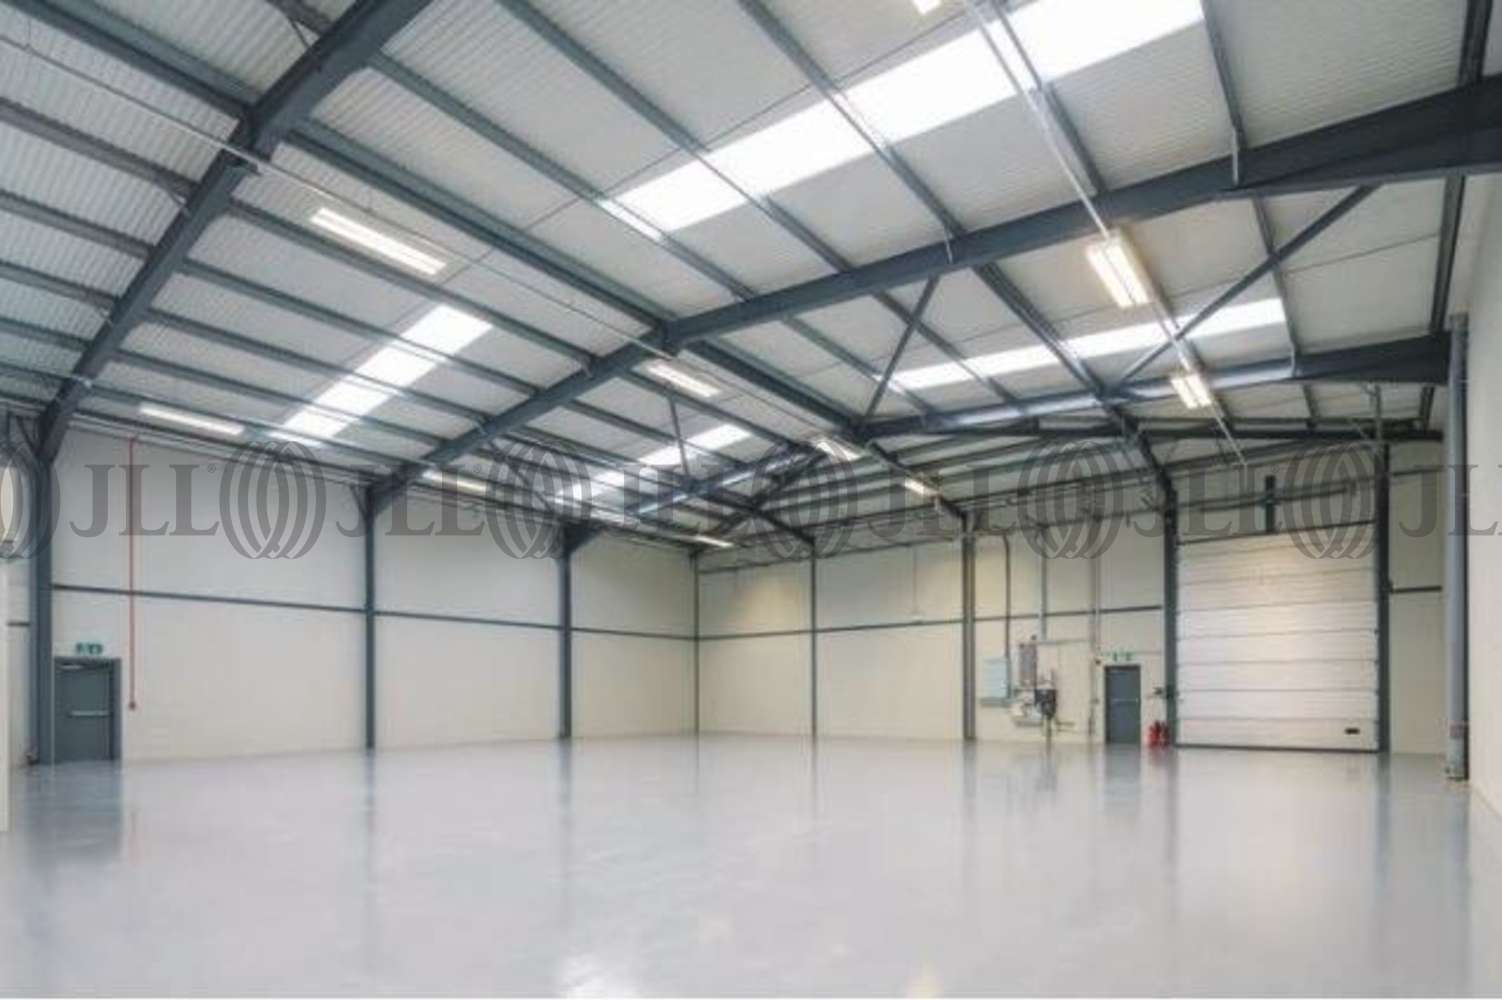 Industrial Slough, SL1 4RD - 242/ 243 Gresham Road - 3